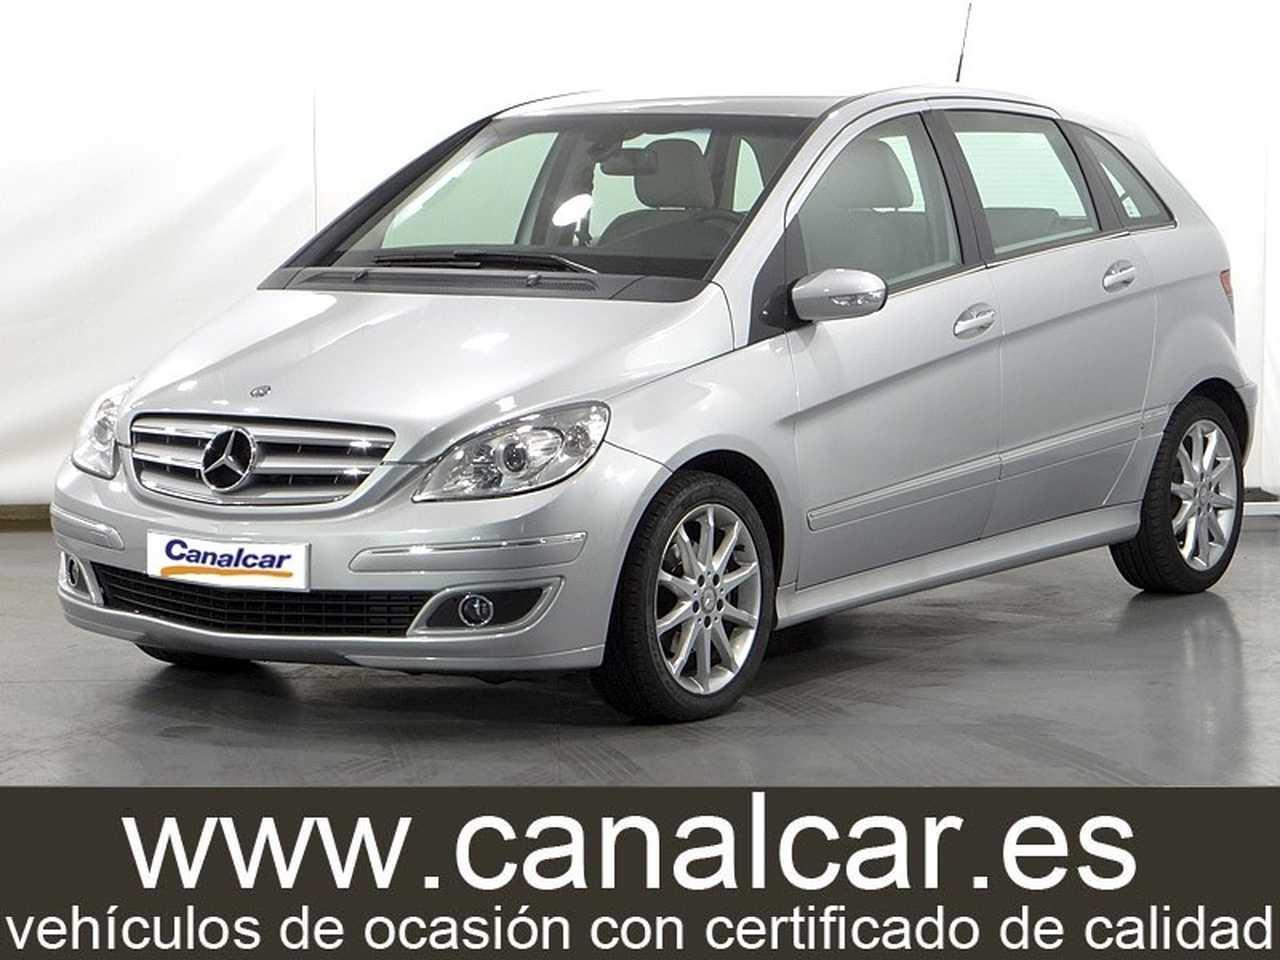 Mercedes Benz Clase B ocasión segunda mano 2008 Gasolina por 7.785€ en Madrid